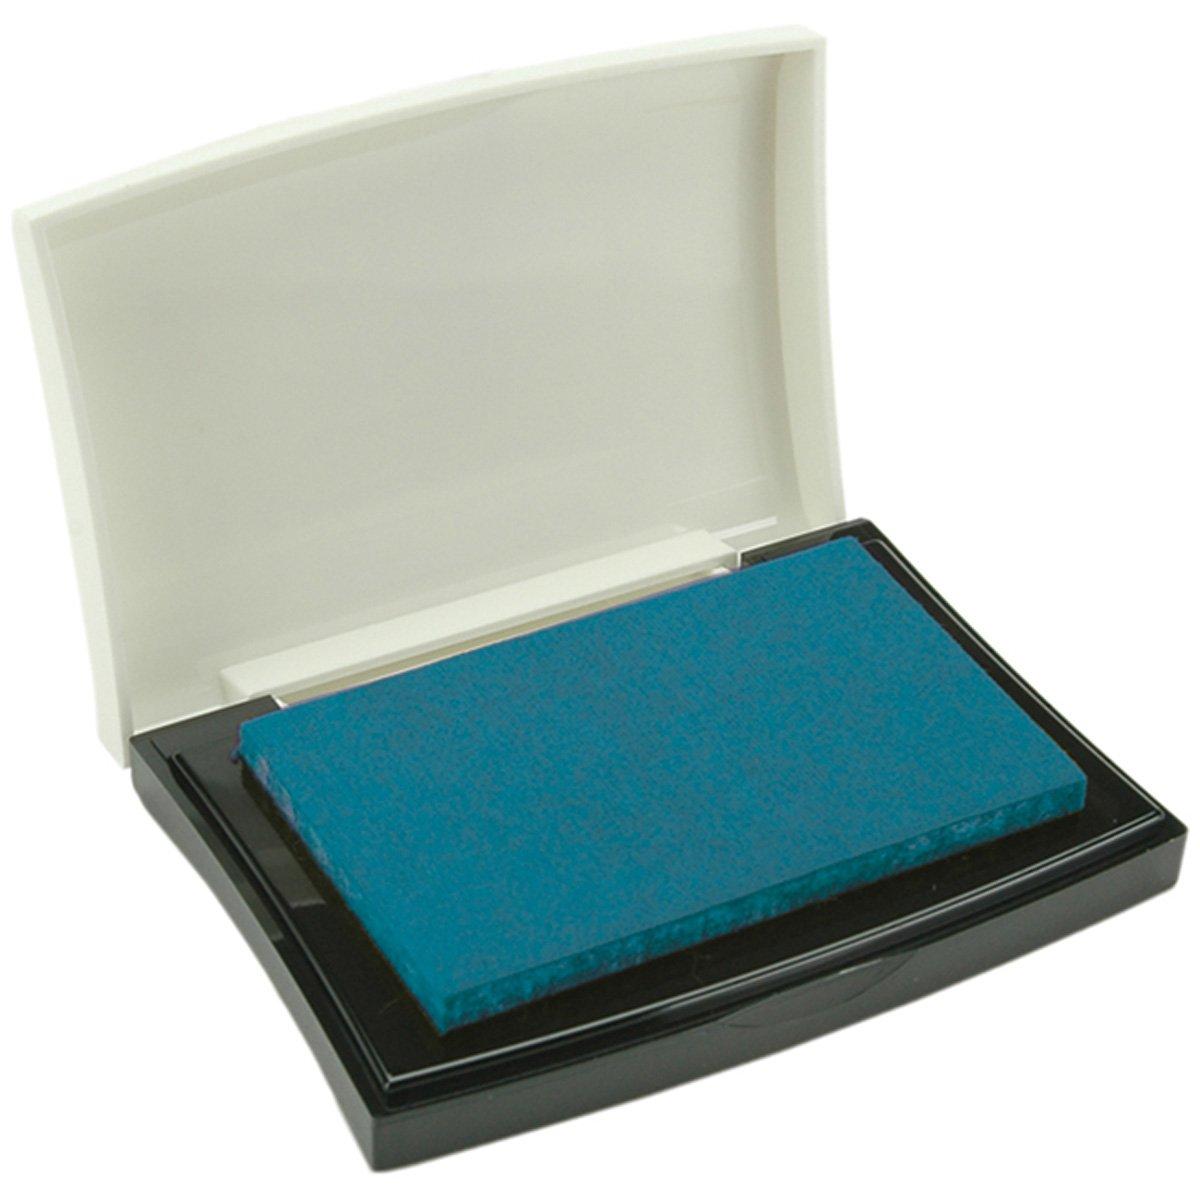 Tsukineko VF000019 Full-Size VersaFine Instant Dry Pigment Ink, Deep Lagoon